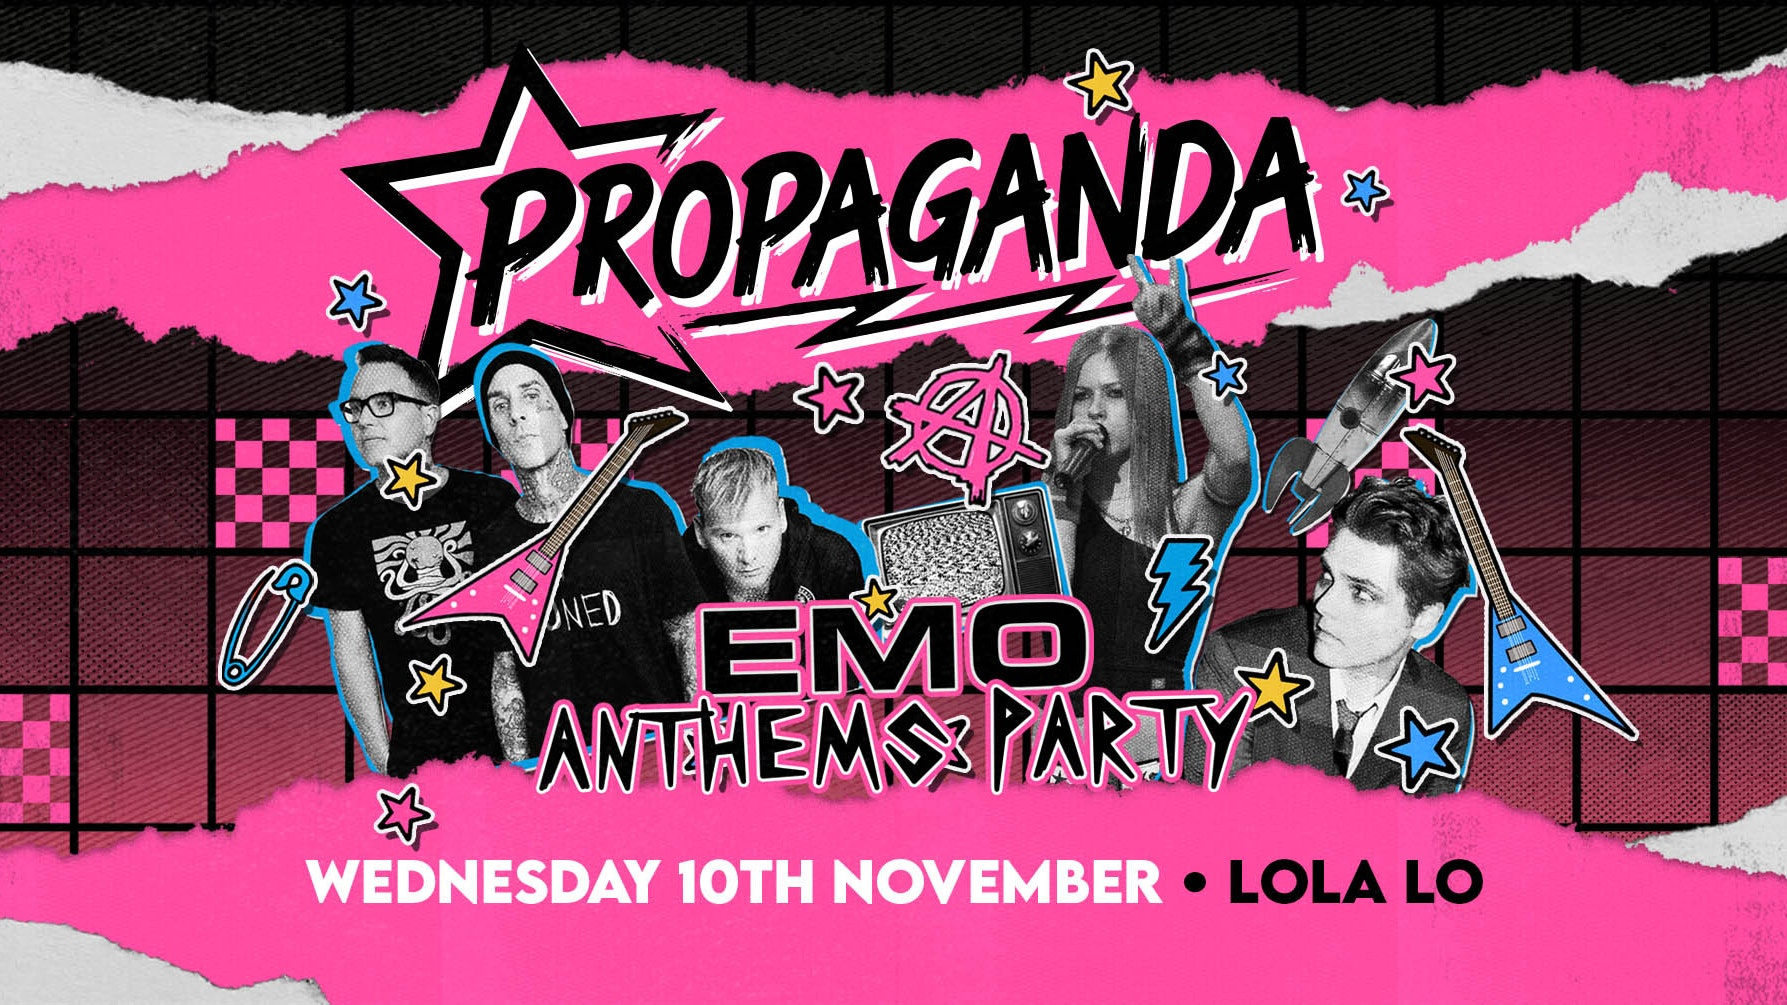 Propaganda Cambridge – Emo Anthems Party!